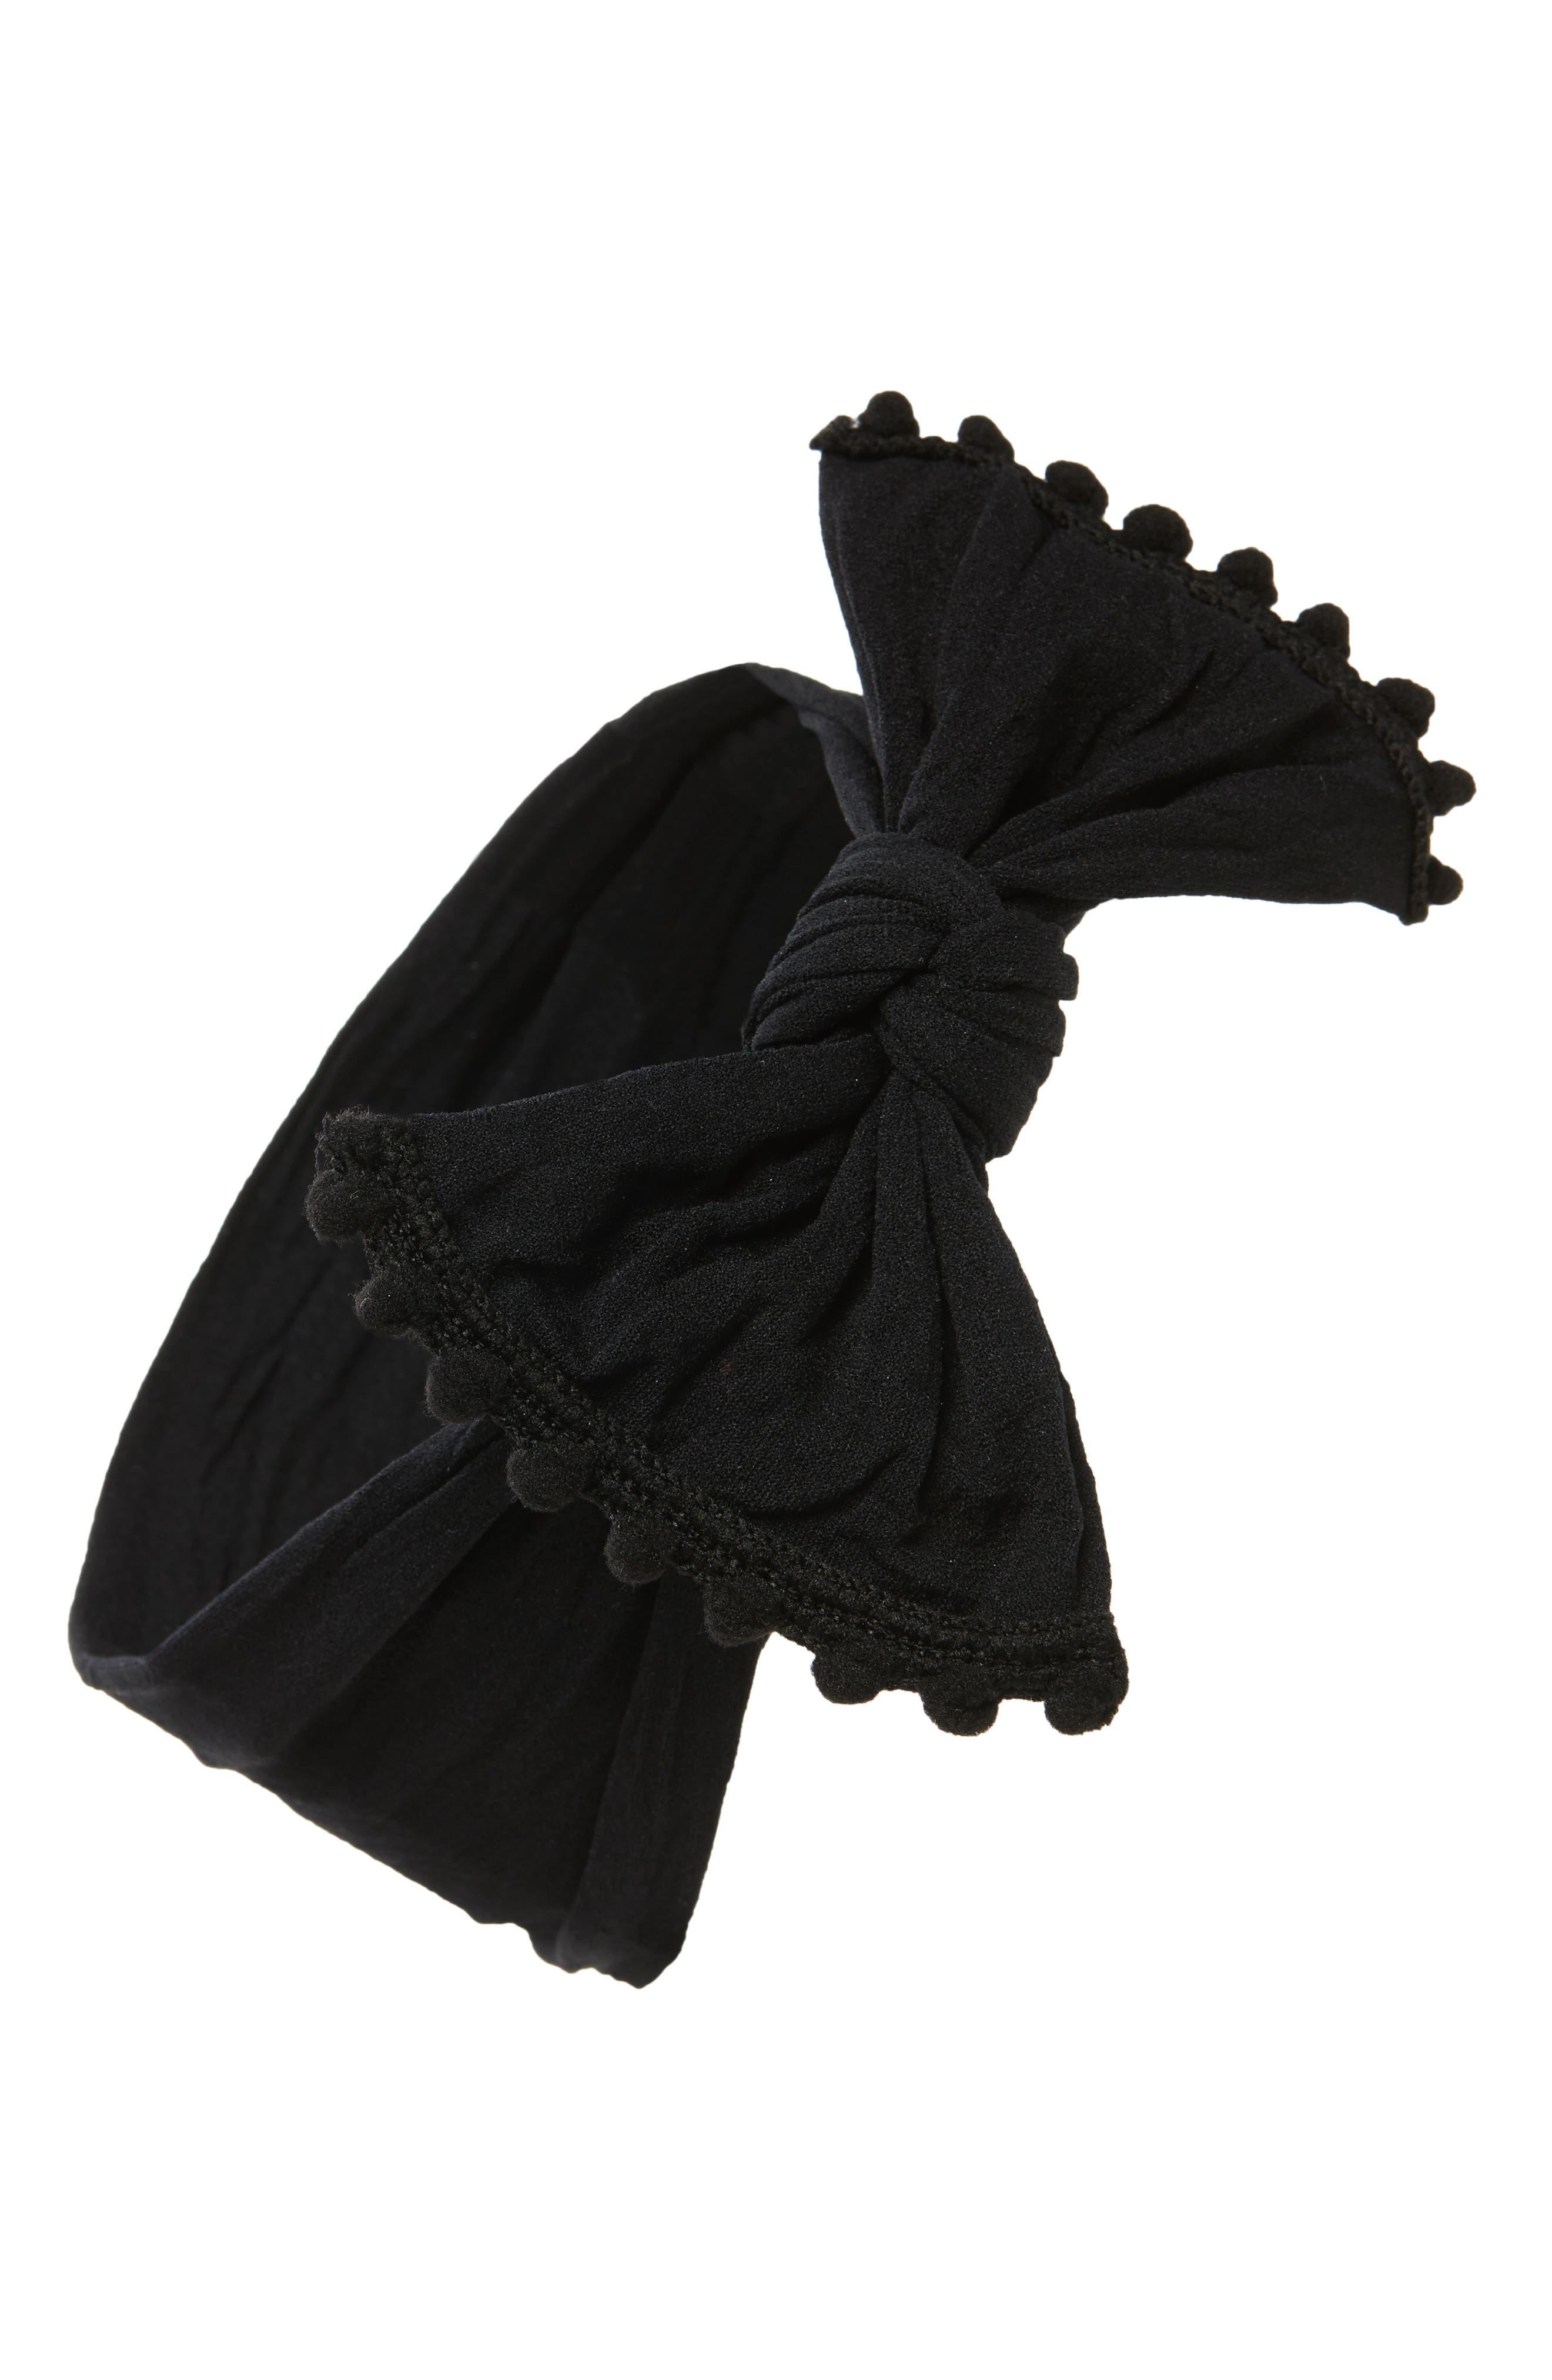 BABY BLING, Pompom Trim Headband, Main thumbnail 1, color, BLACK POM